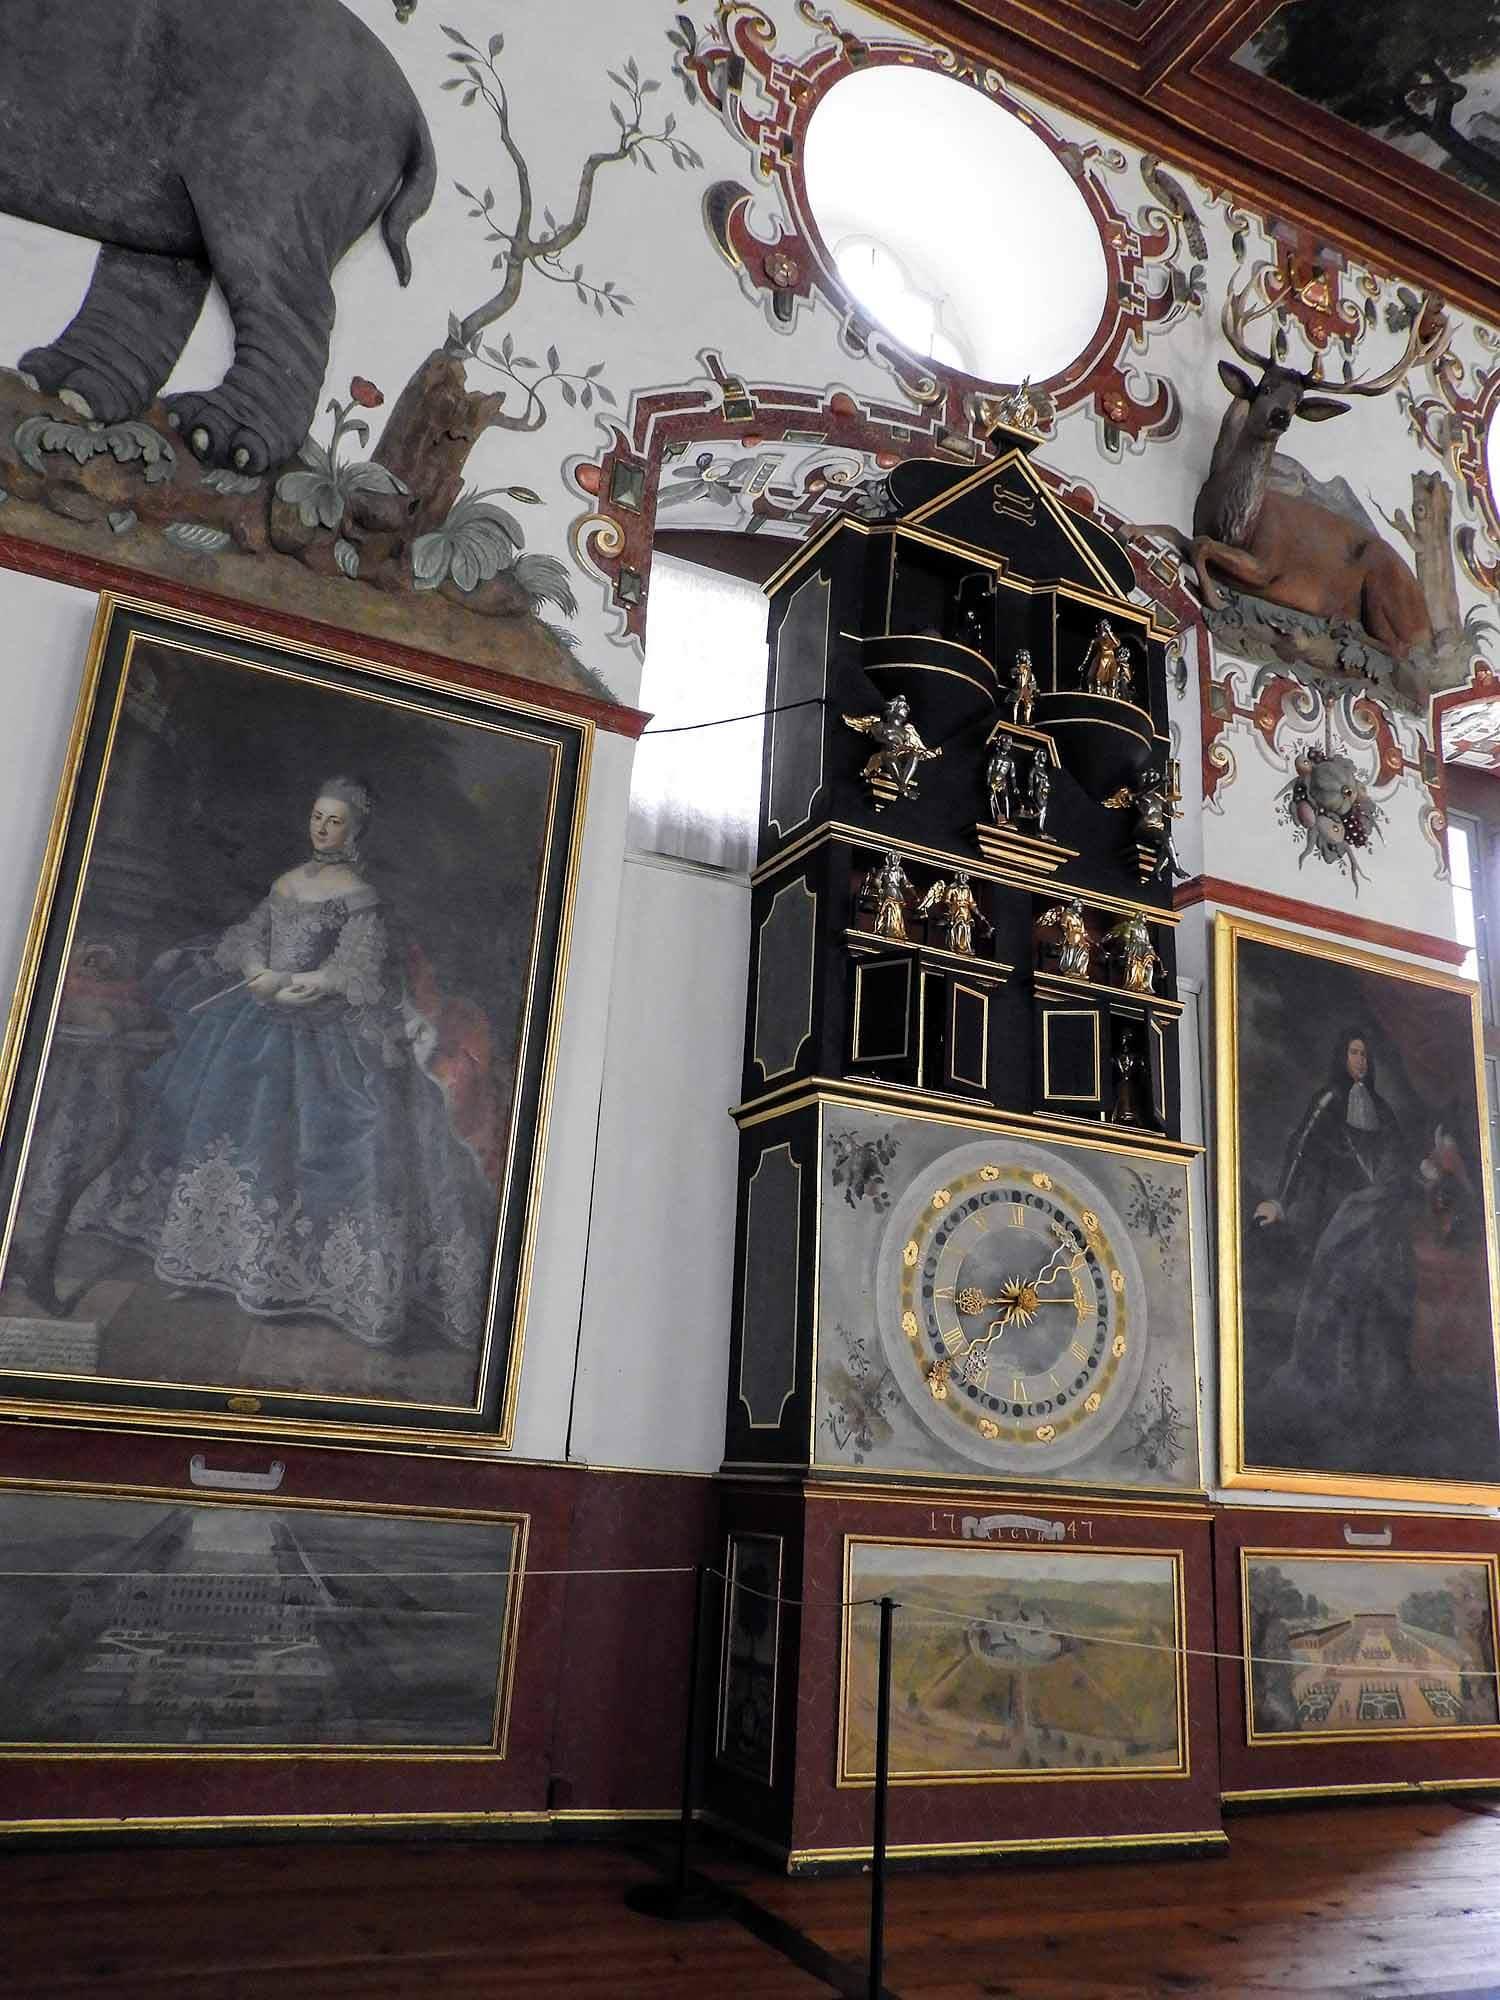 germany-Weikersheim-castle-gardens-schloss-grand-hall-hunting-jagd-trophies.jpg